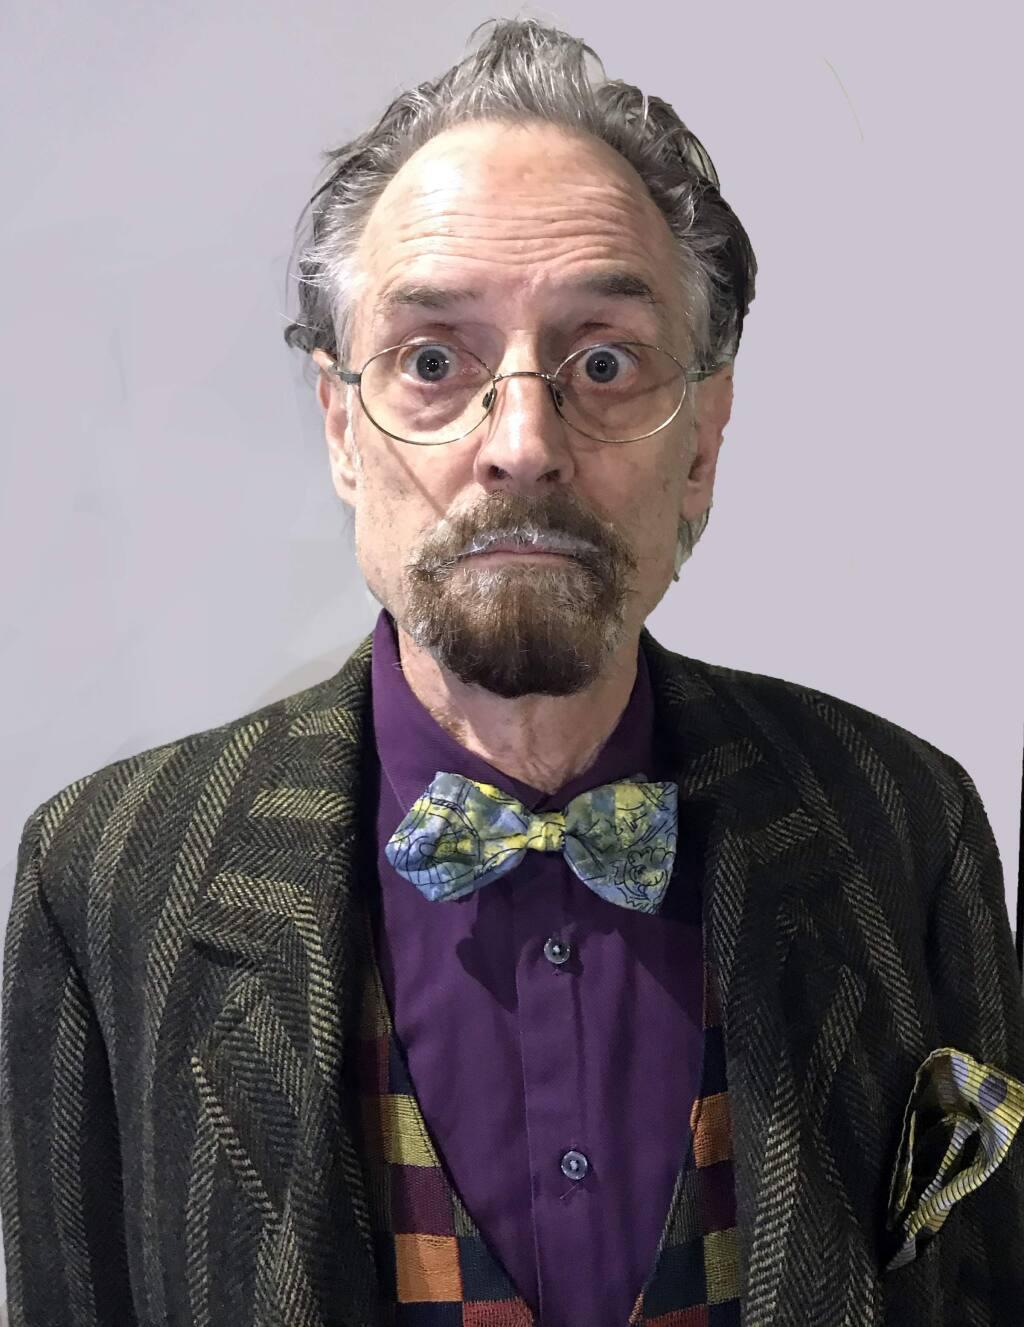 John Craven stars in the political farce 'Accidental Death of an Anarchist' at Main Stage West in Sebastopol. (Elizabeth Craven)